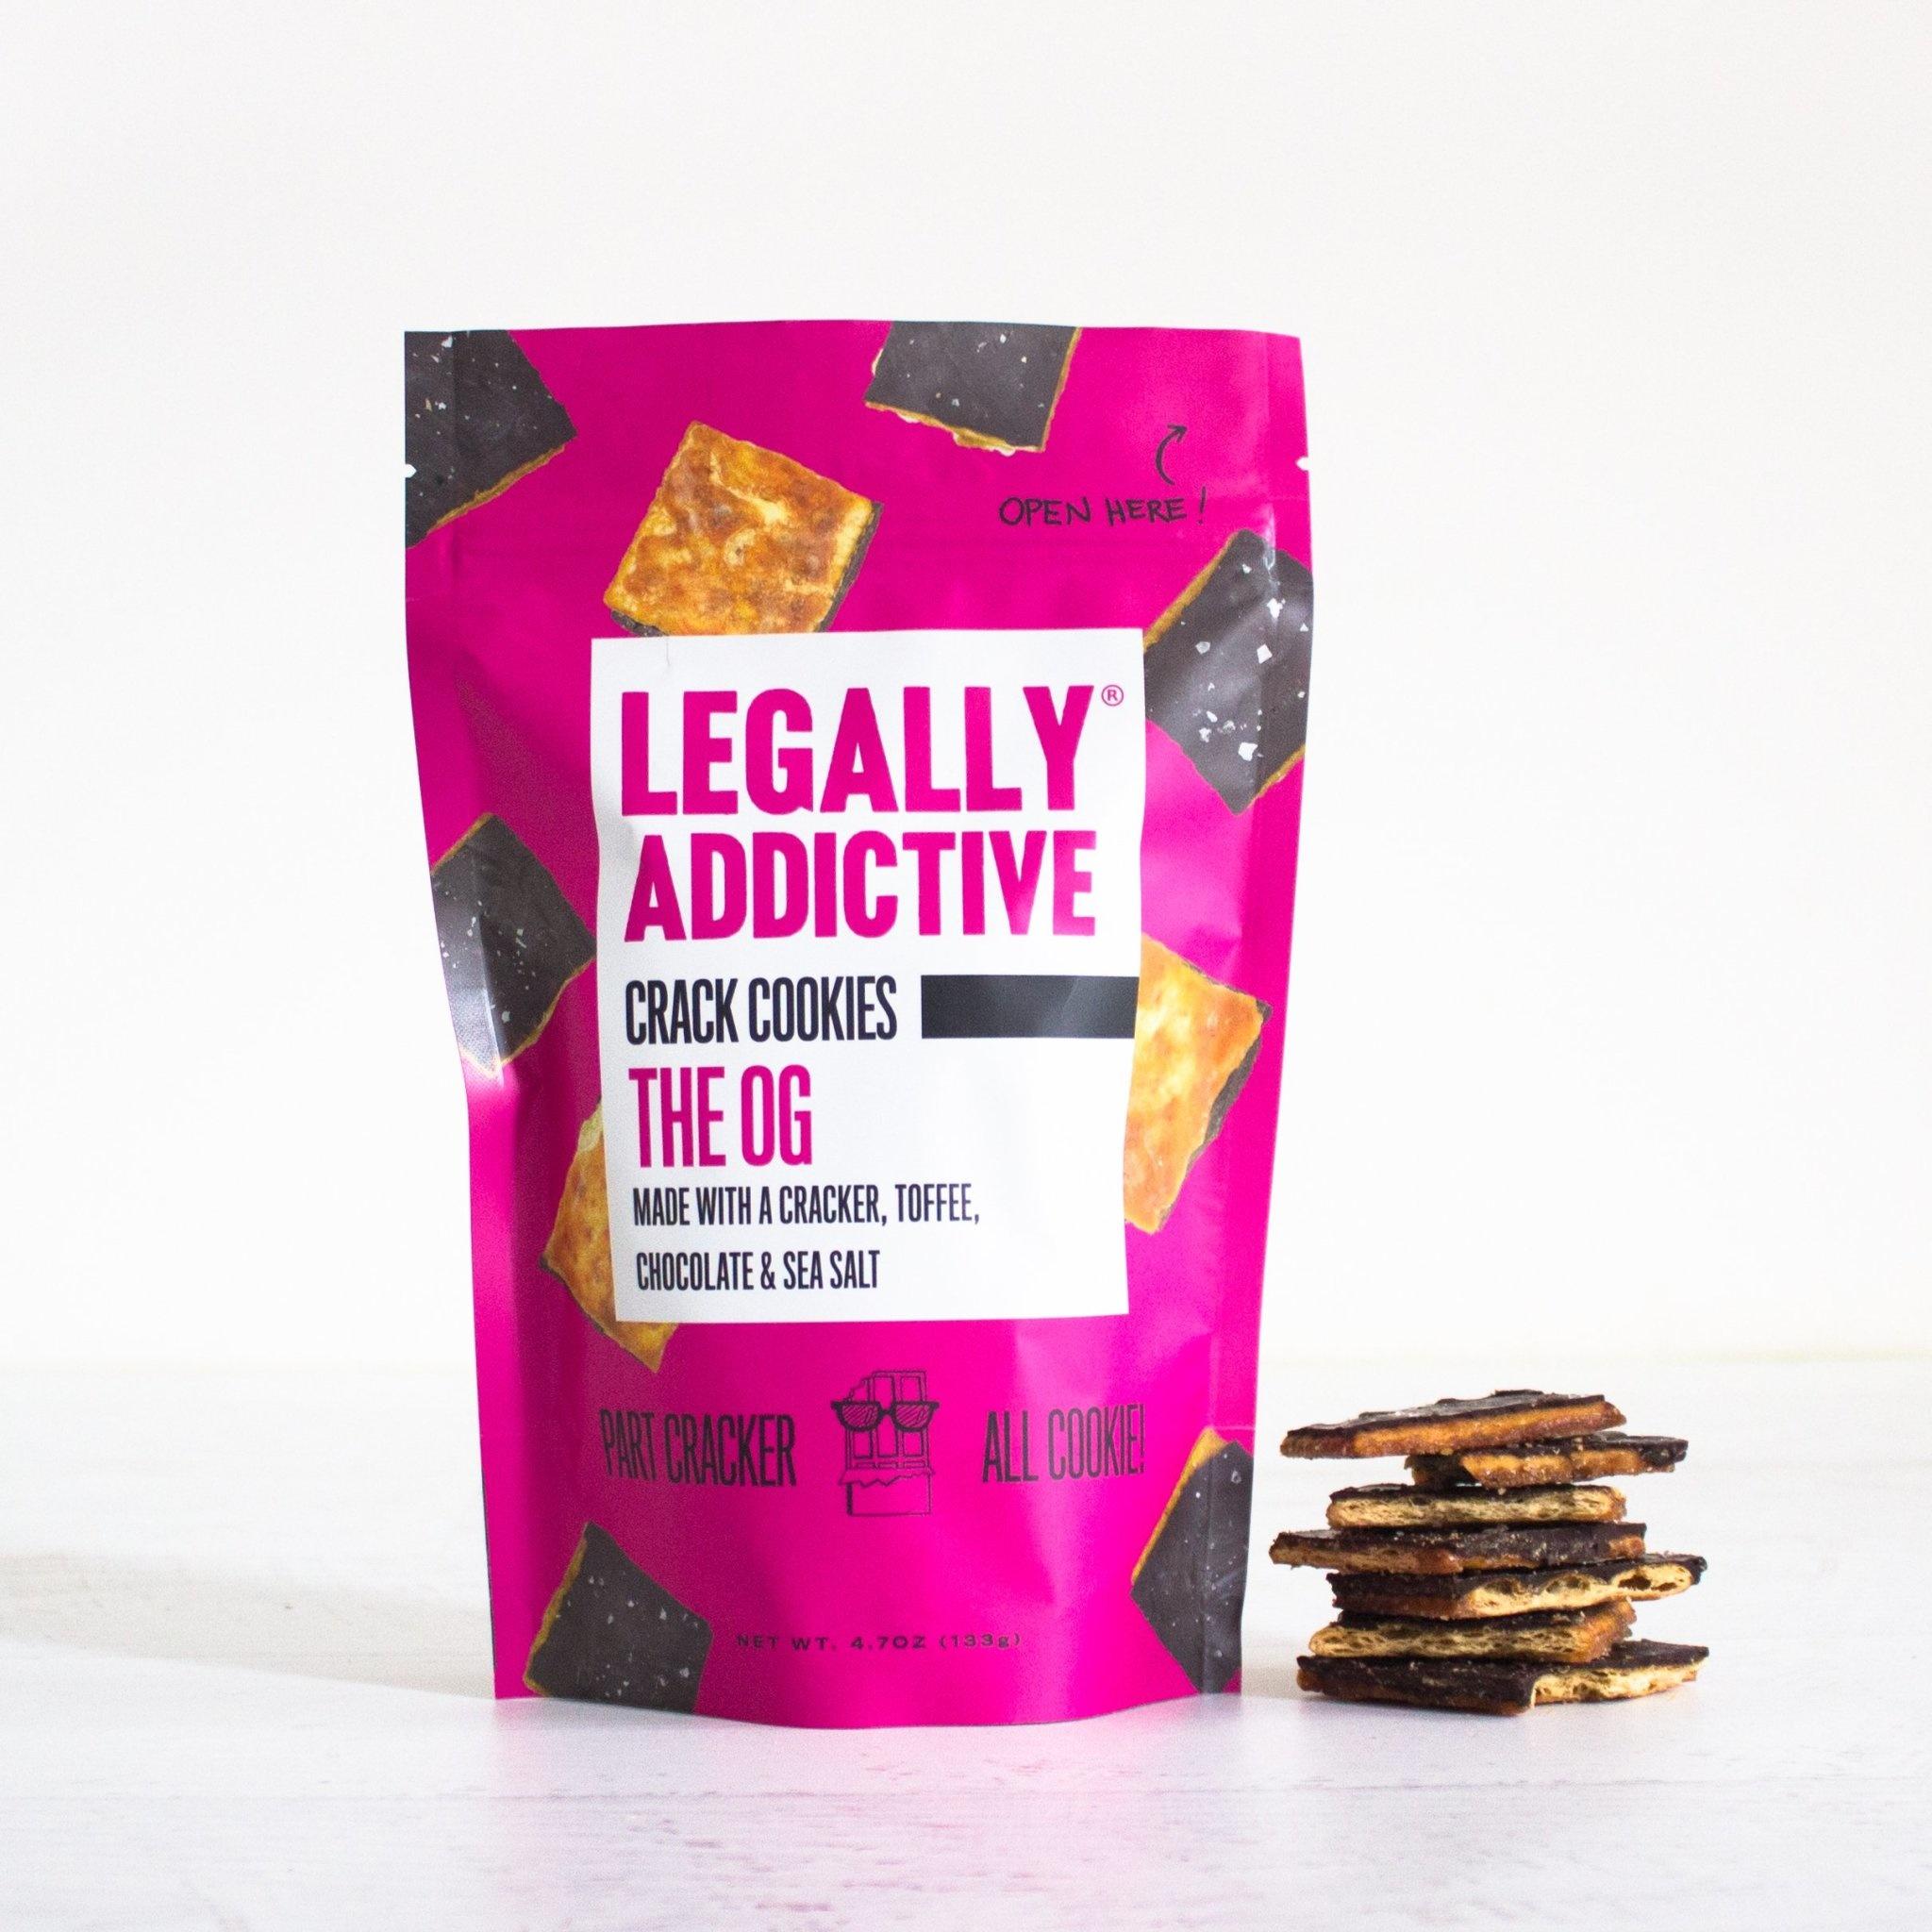 Legally Addictive Crack Cookies The OG